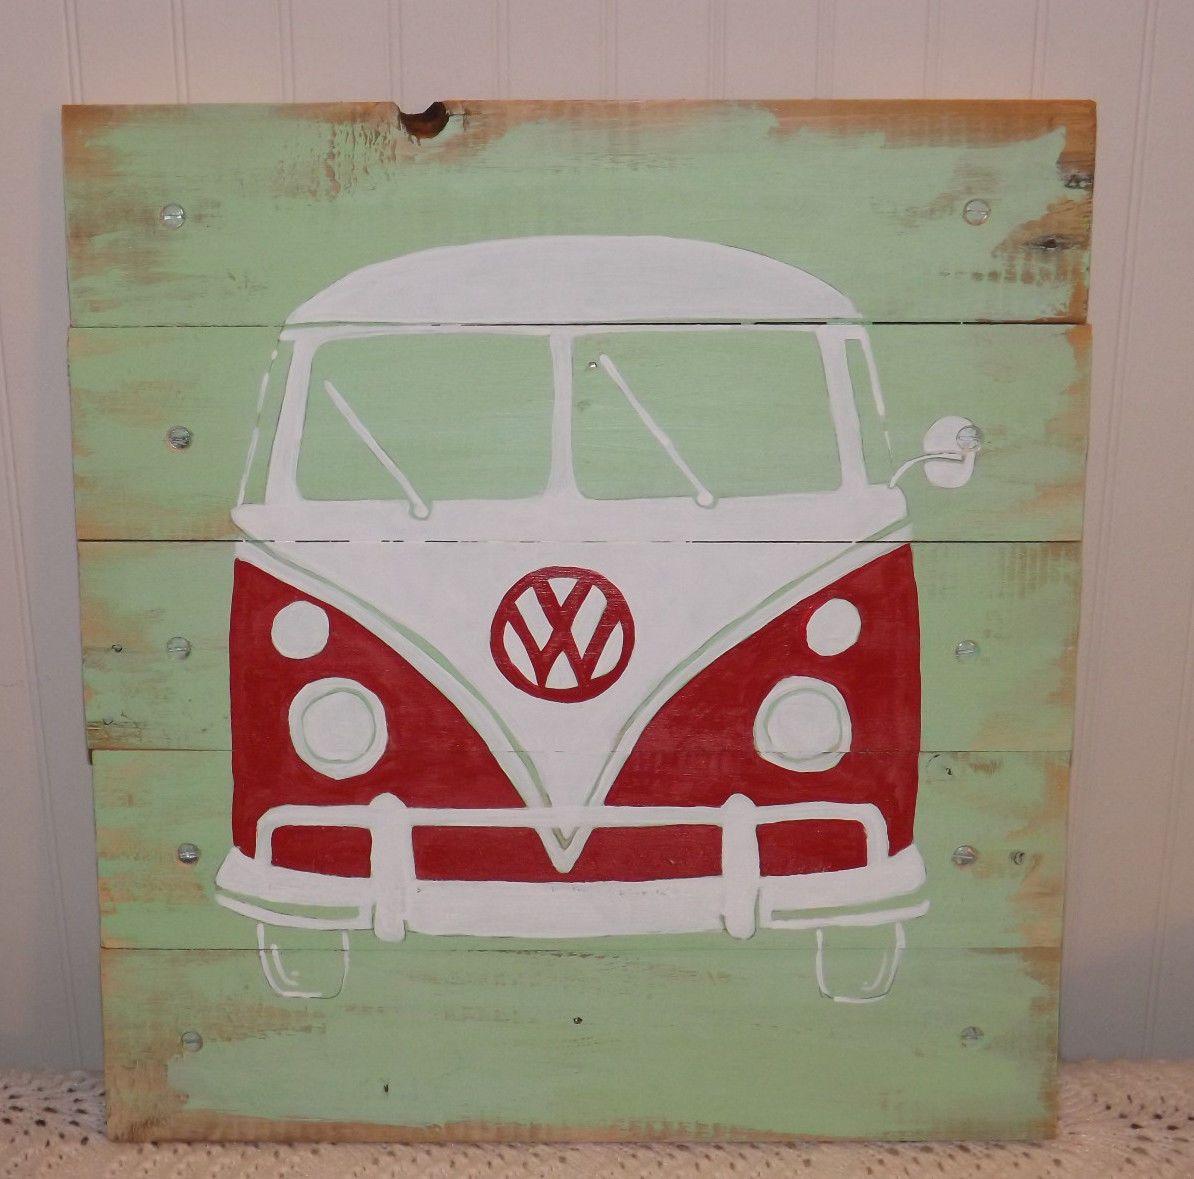 Volkswagen Vw Bus Transporter Hippie Surf Original Artwork Pallet Retro Wall Art Retro Wall Art Vw Art Bus Art